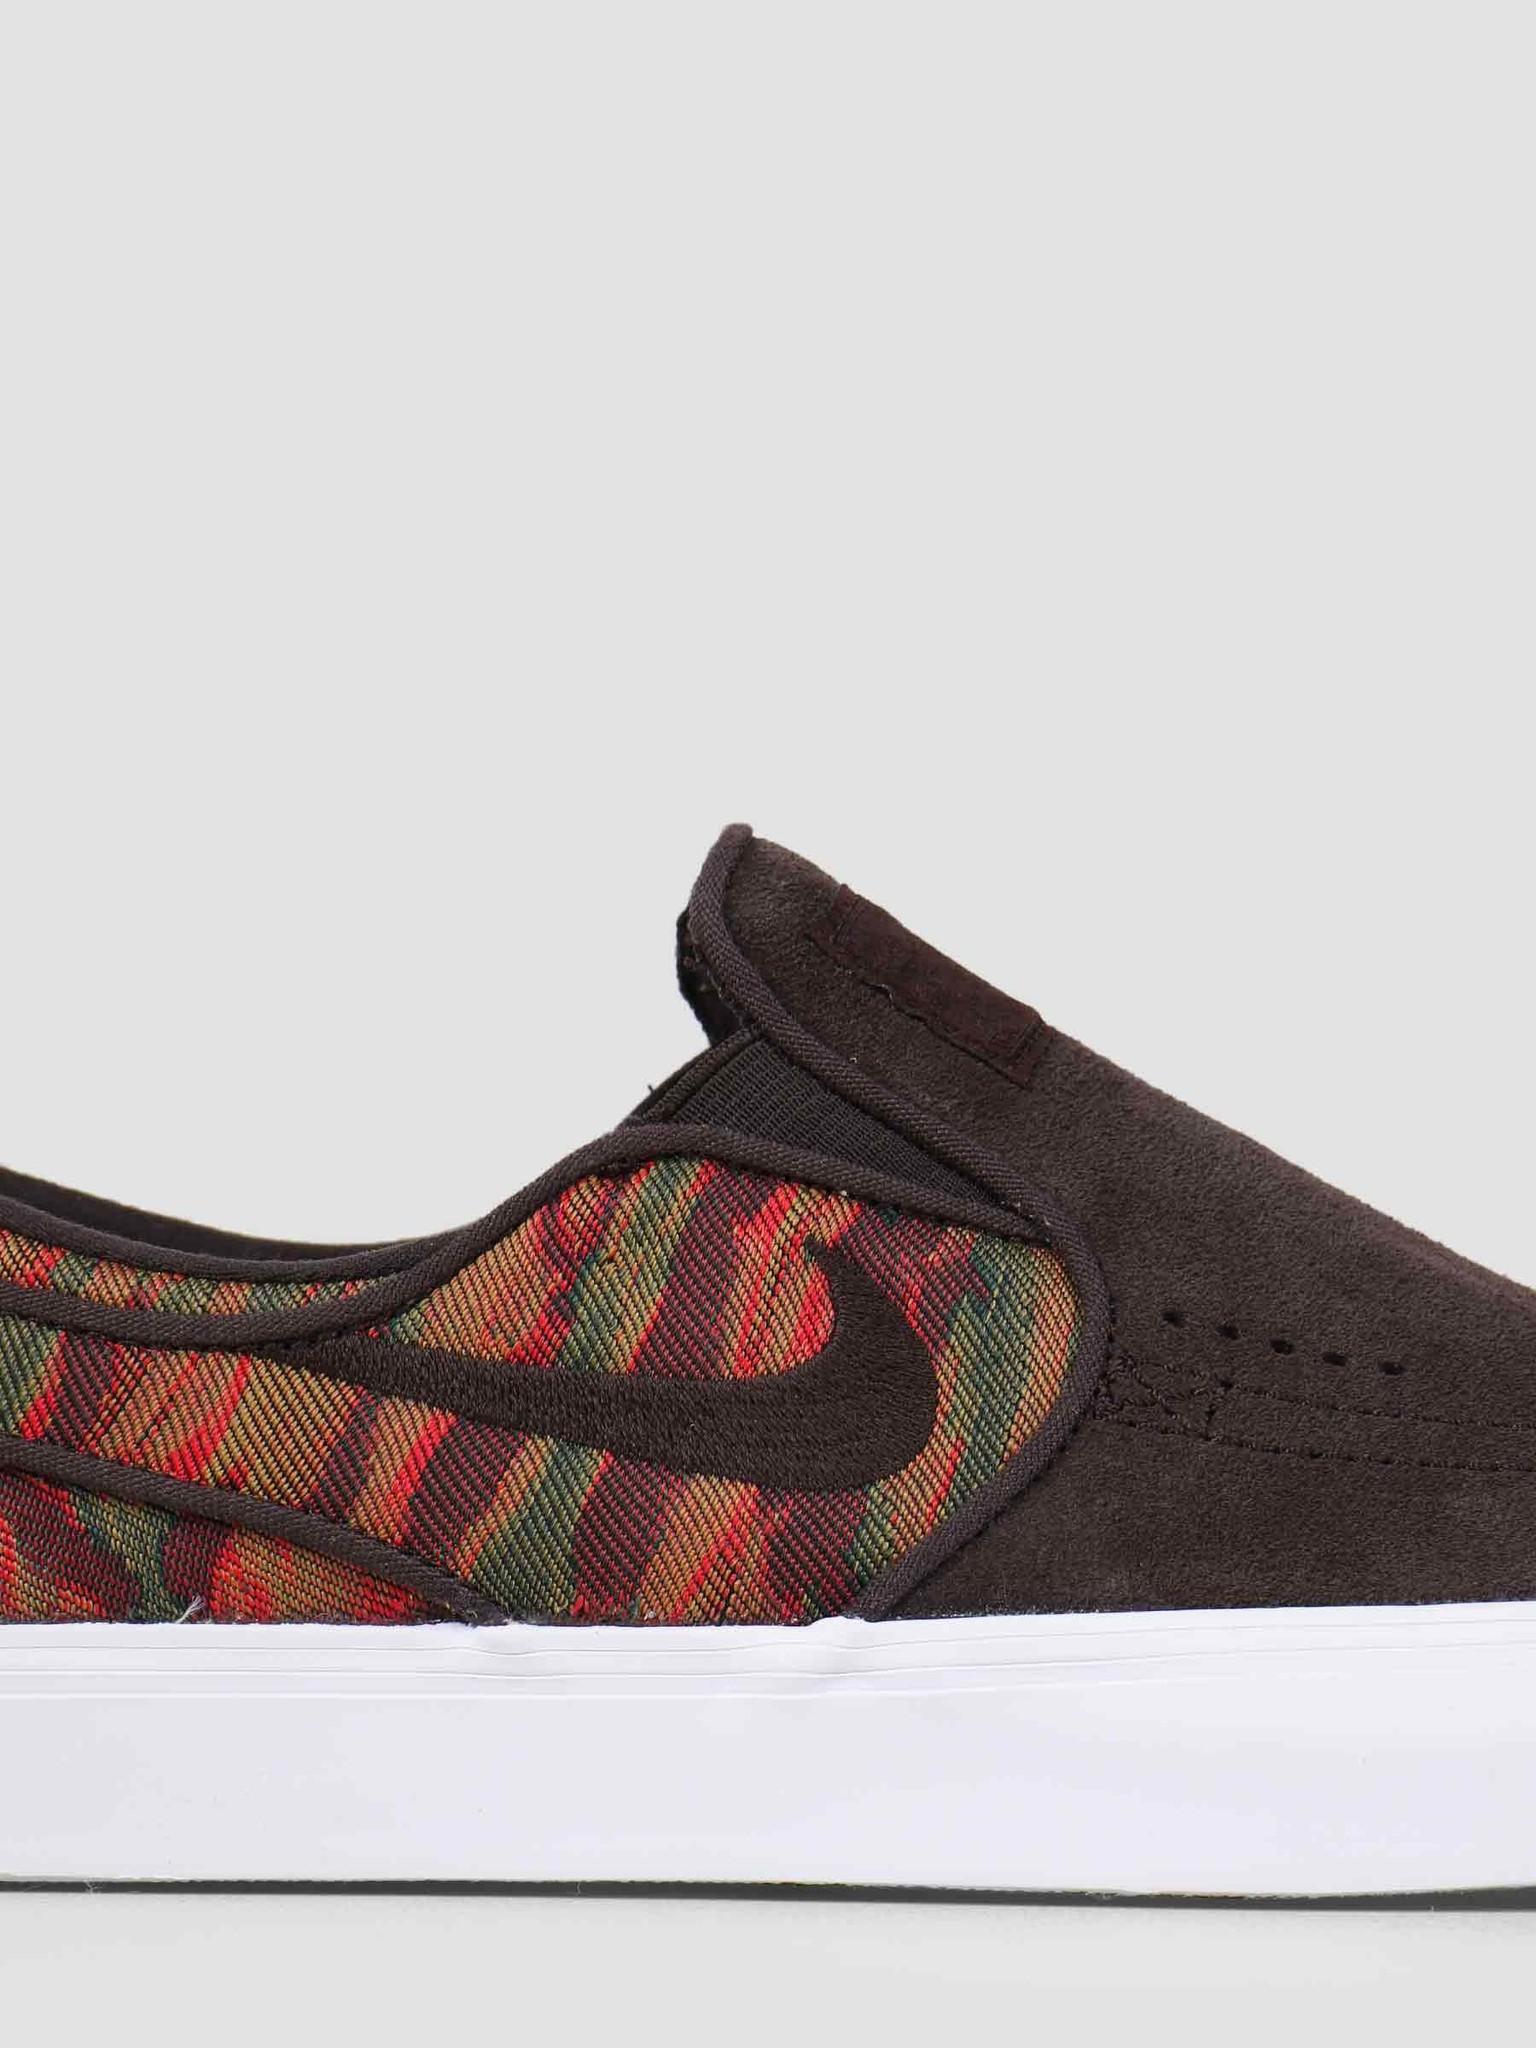 save off 29dff 3a7ff Nike Nike Sb Zoom Stefan Janoski Slip Premium Skateboarding Velvet Brown  833582-200